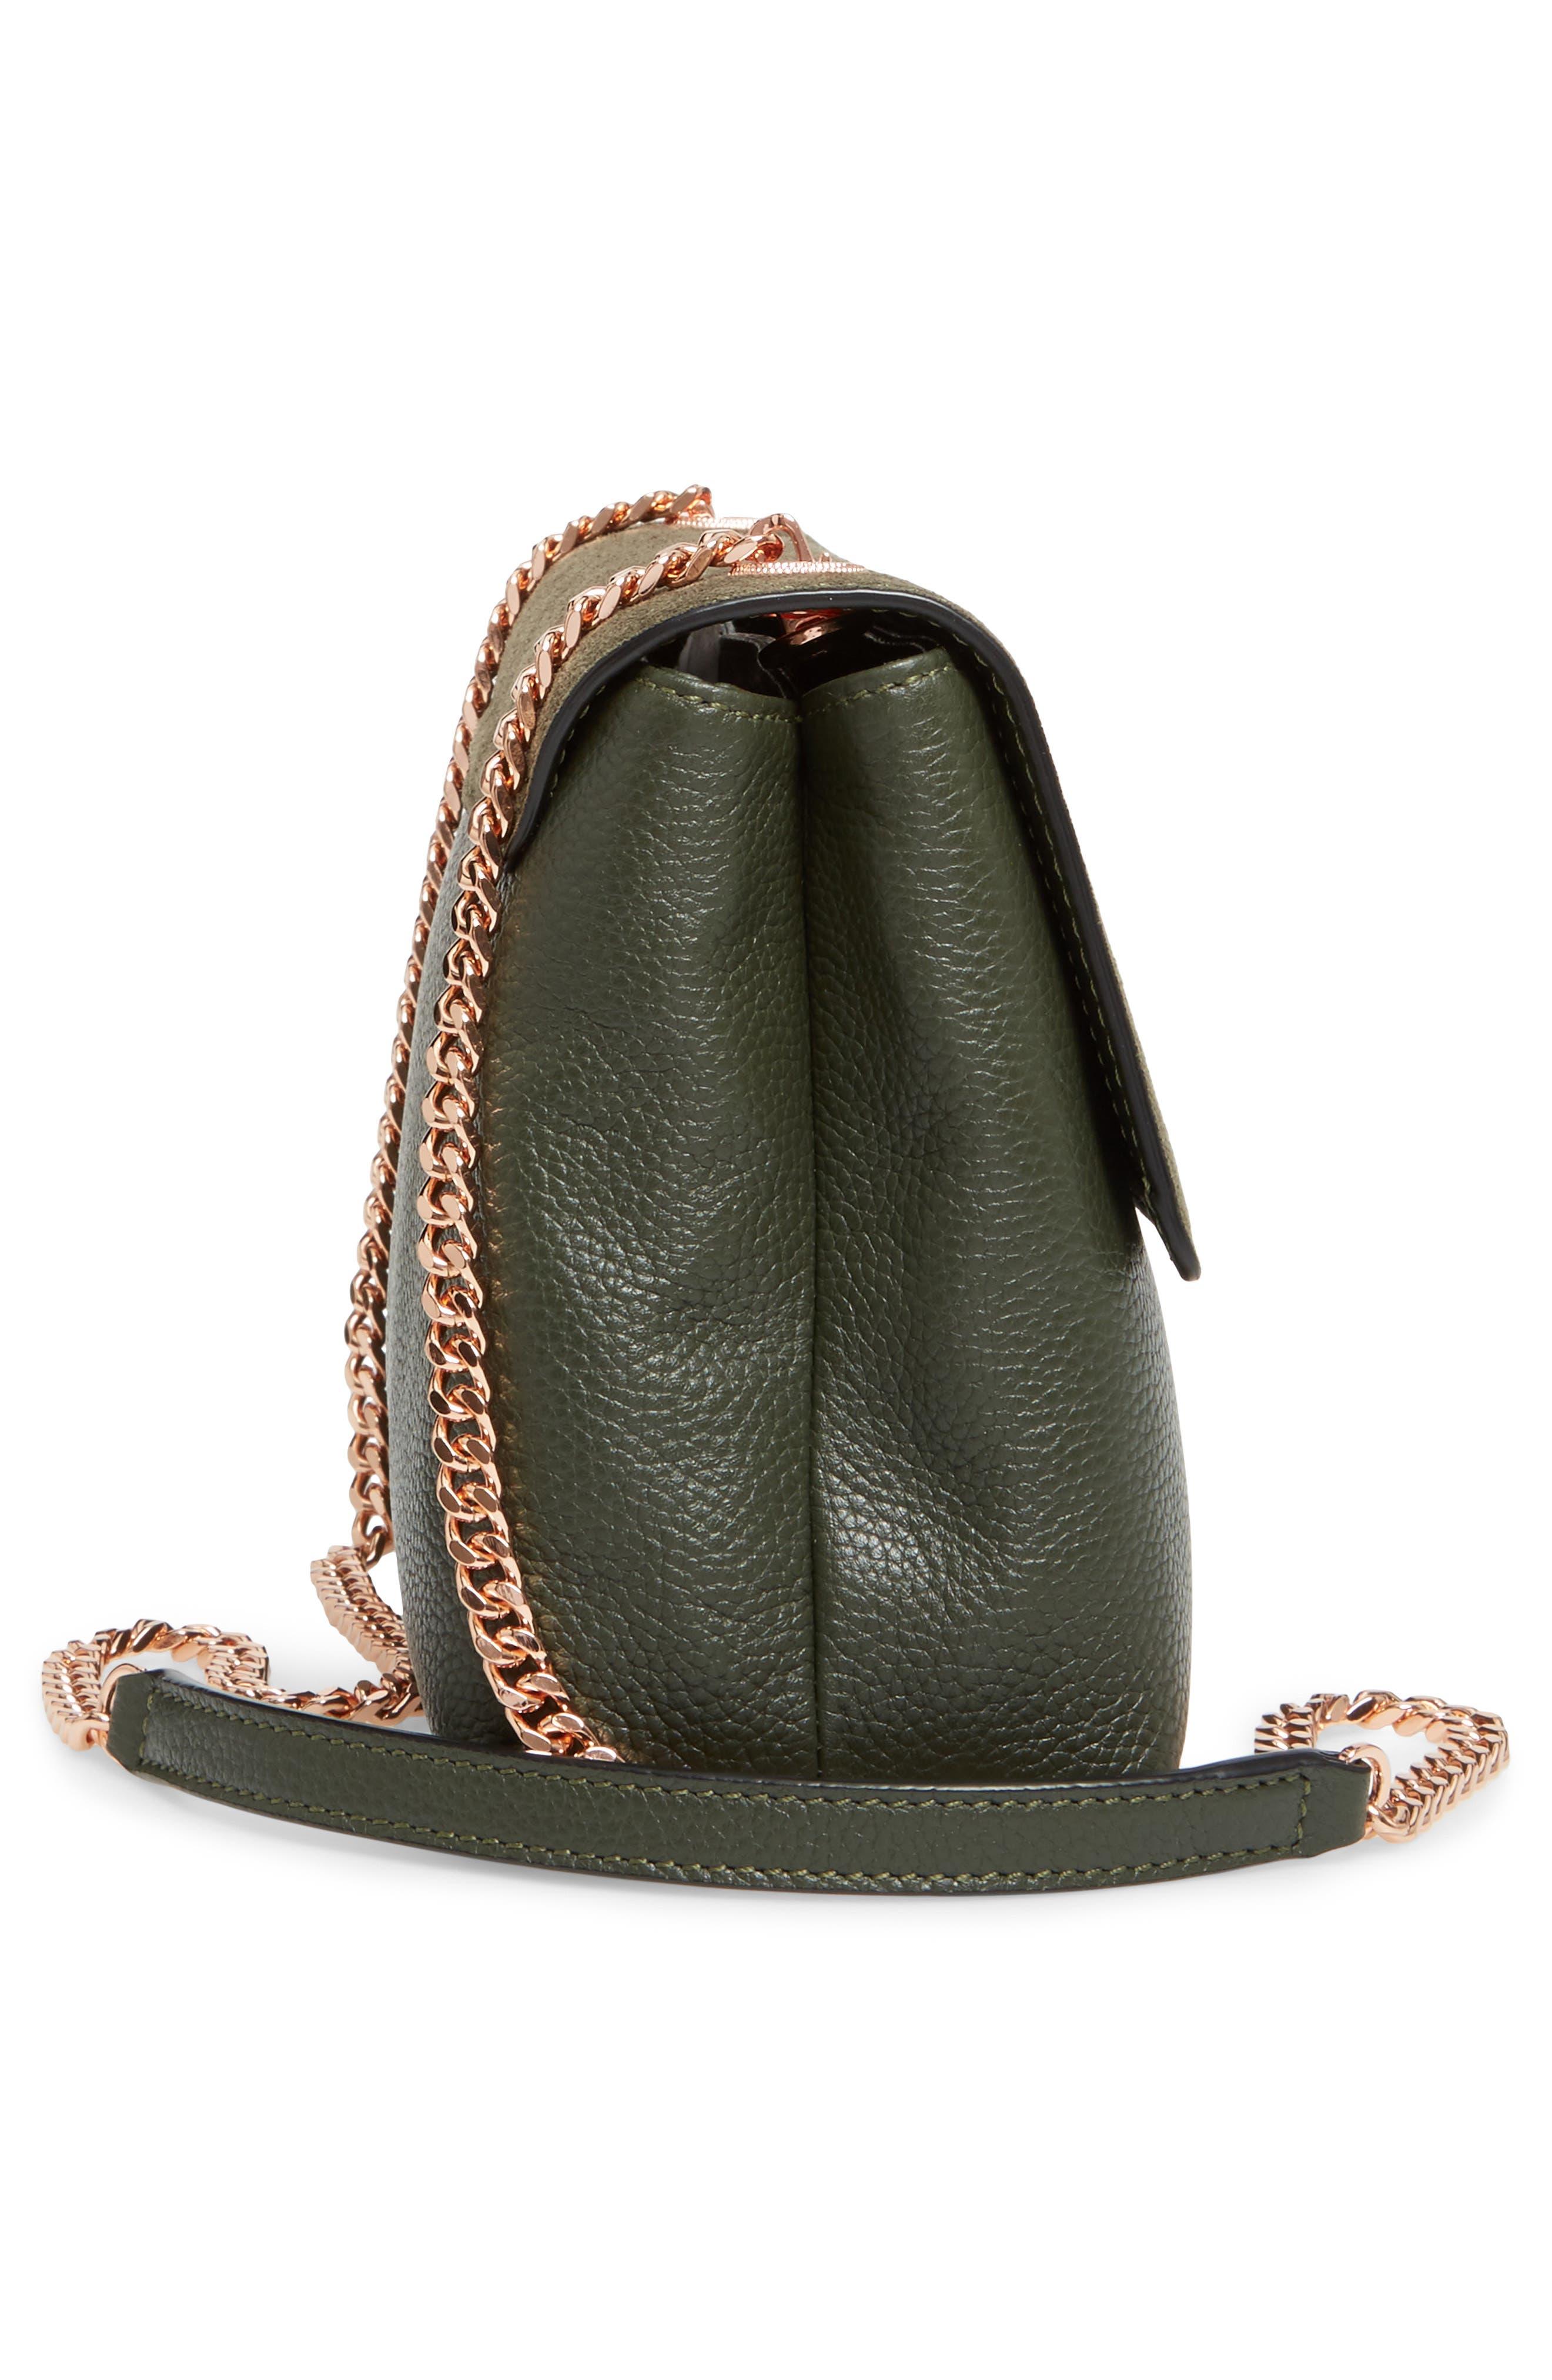 Sorikai Leather & Suede Crossbody Bag,                             Alternate thumbnail 5, color,                             312